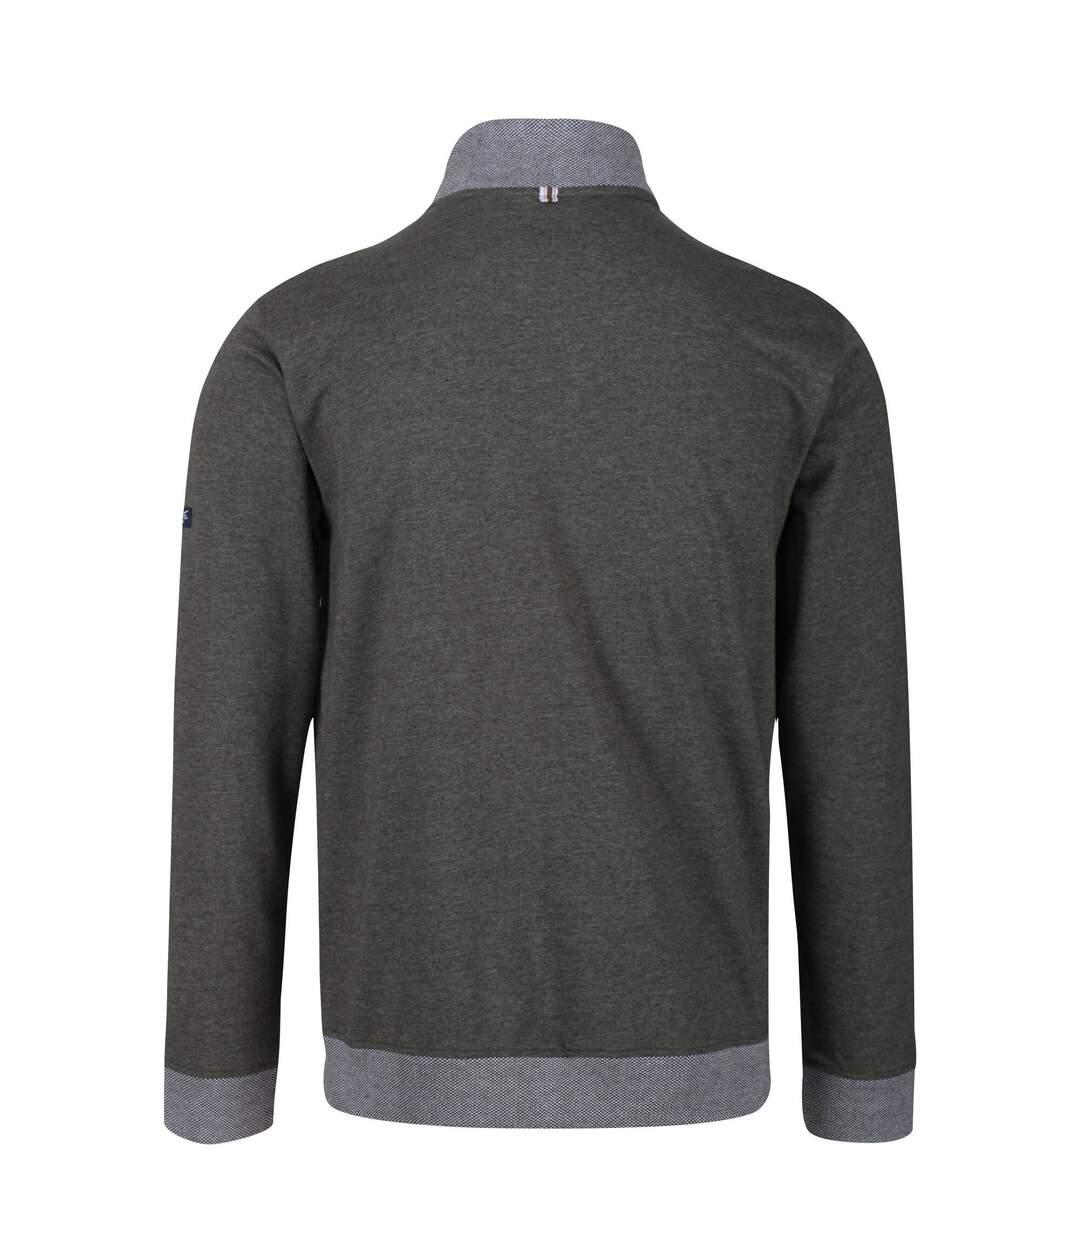 Regatta Mens Everard Full Zip Fleece (Dark Khaki) - UTRG5048